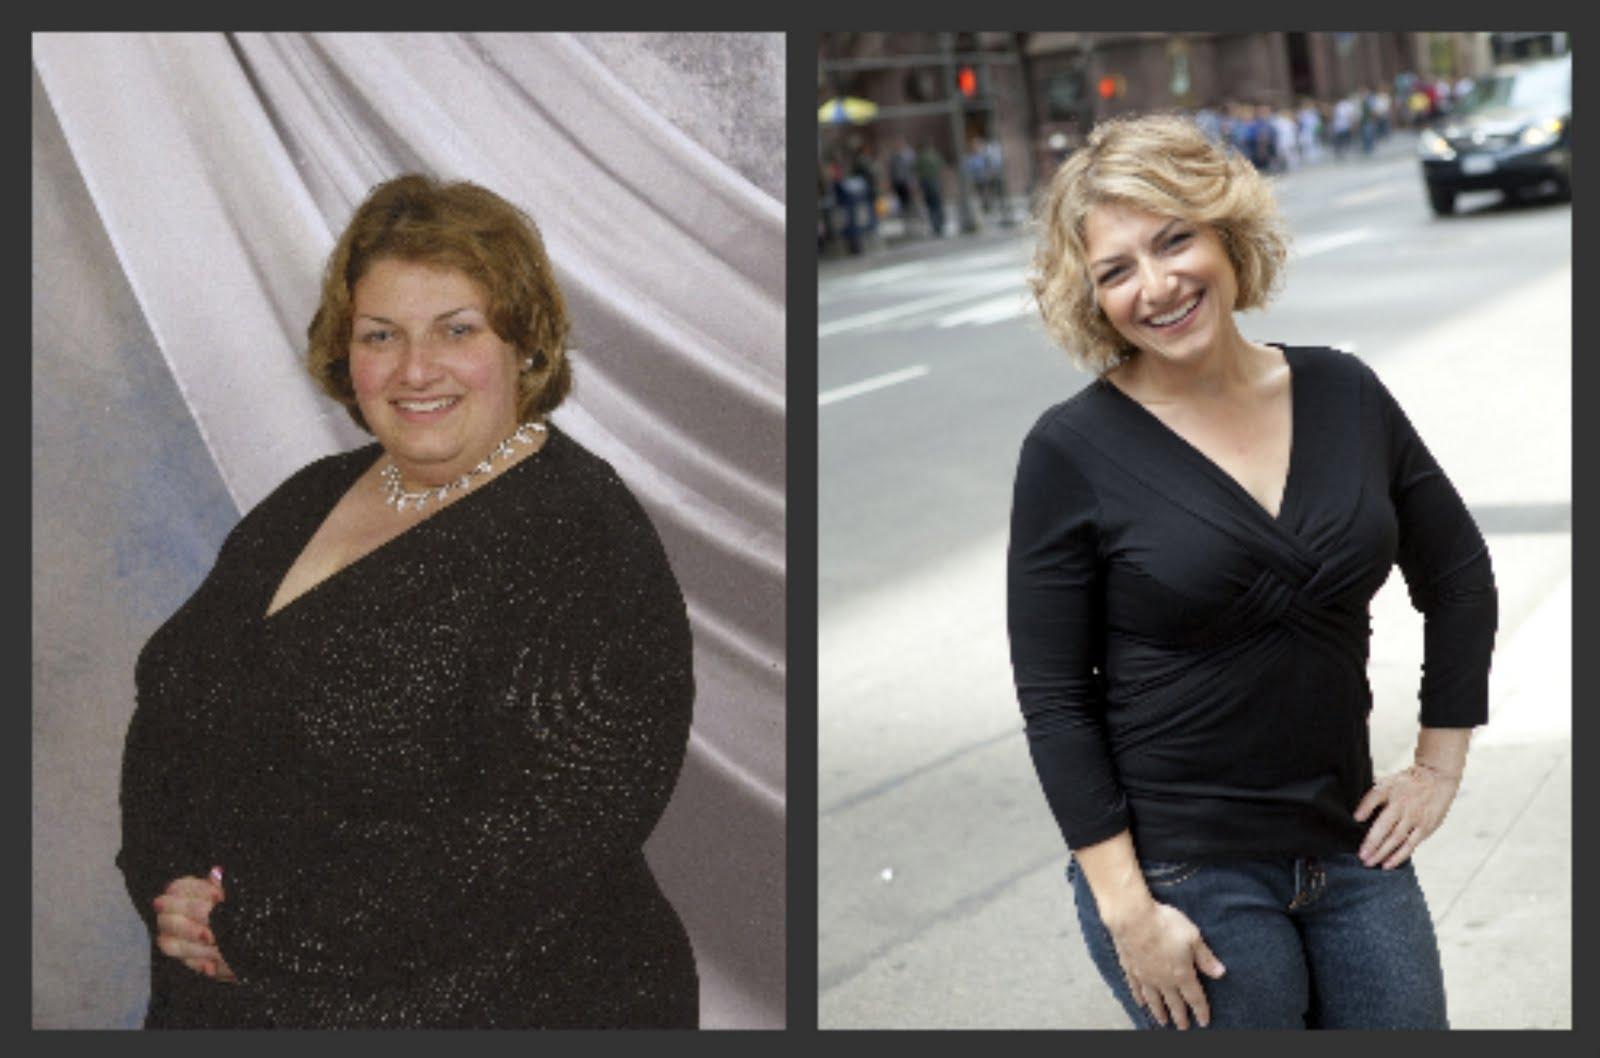 weight loss surgery meet and greet